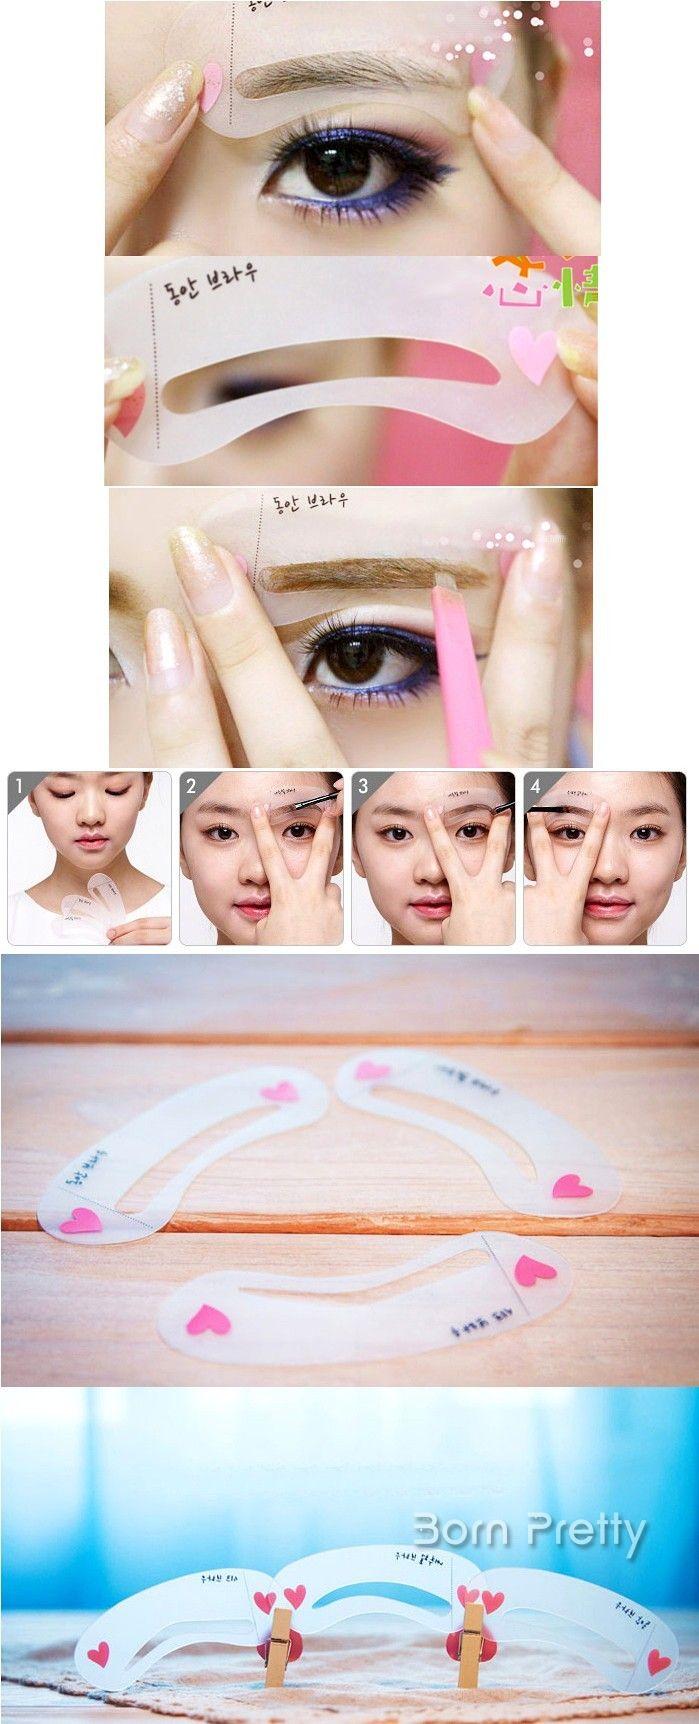 $2.93 3Pcs/Set Brow Class Drawing Guide Eyebrow Template Plastic Makeup Shaping DIY Beauty Tool - BornPrettyStore.com